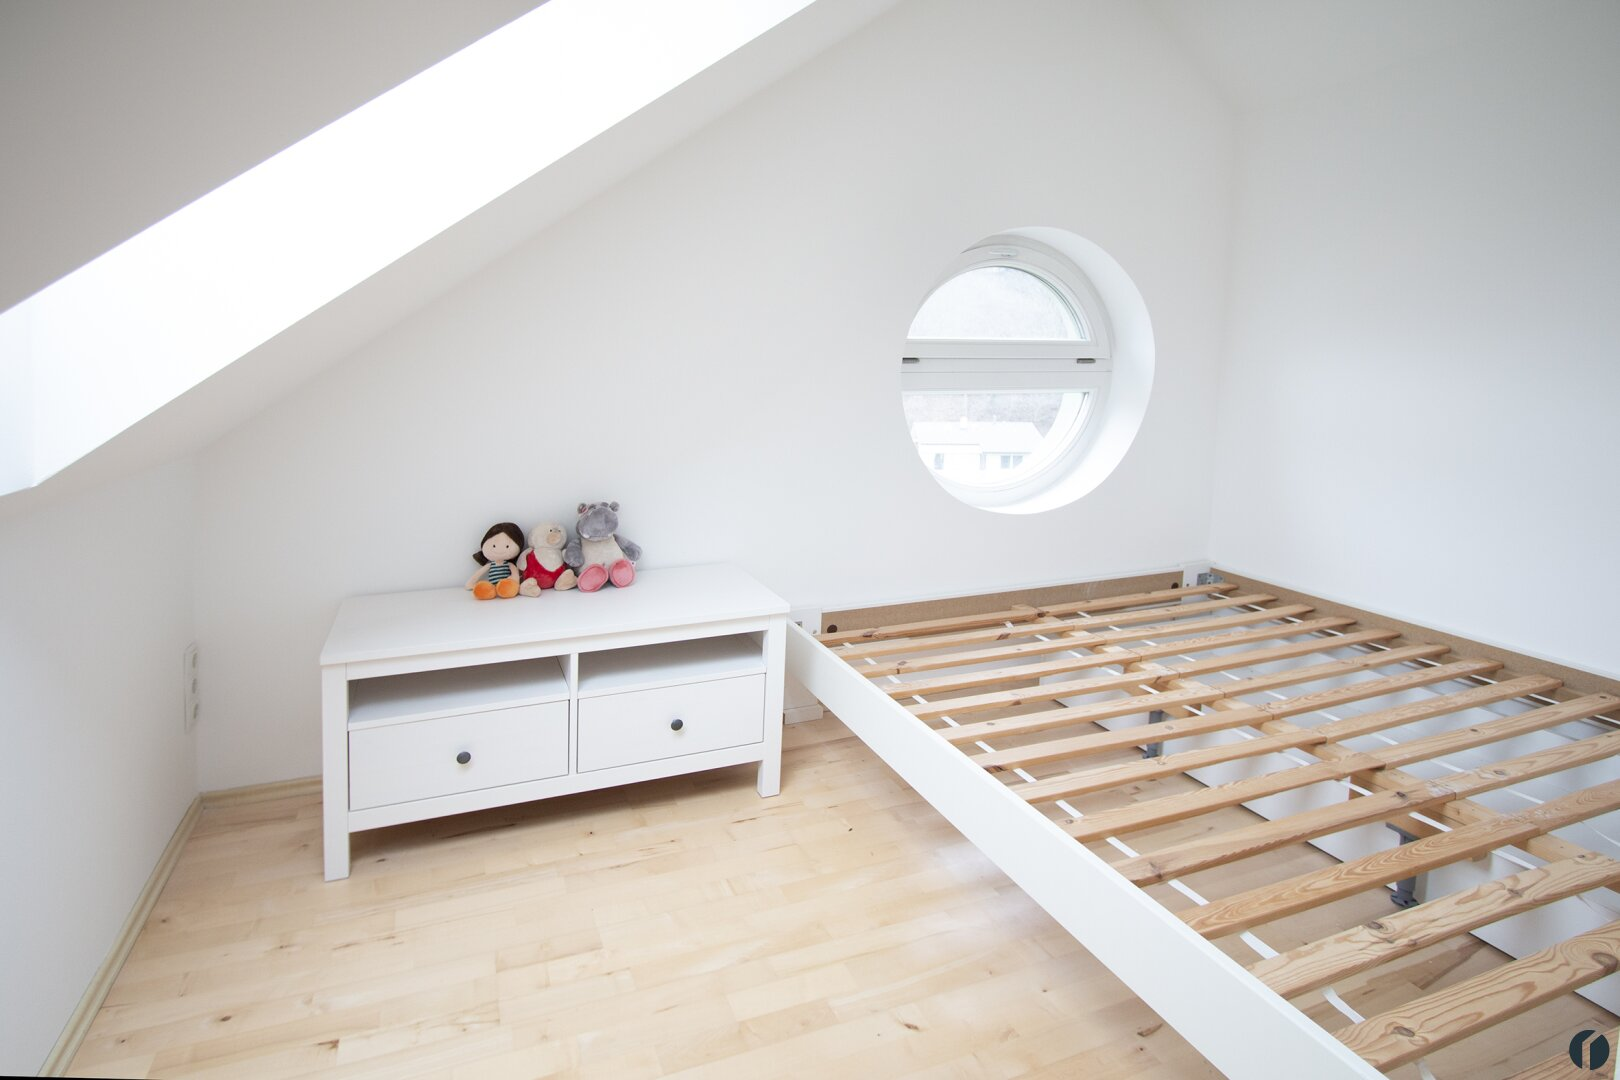 2. Kinderzimmer oberer Bereich